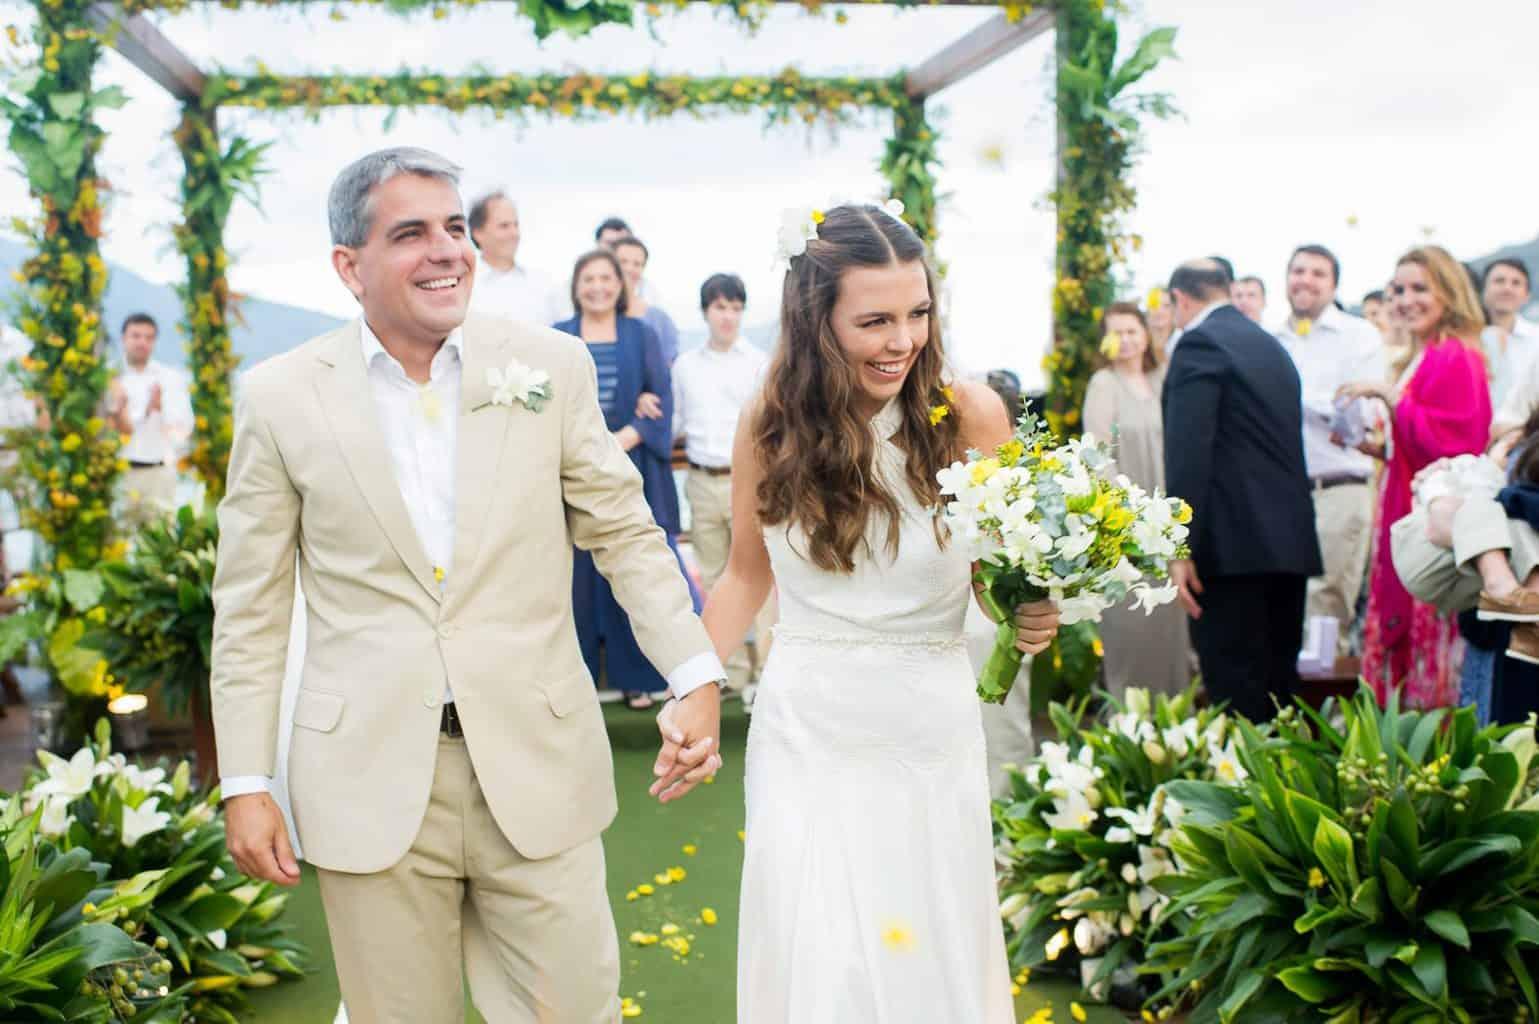 casamento-real-anda-e-rodrigo-caseme-68